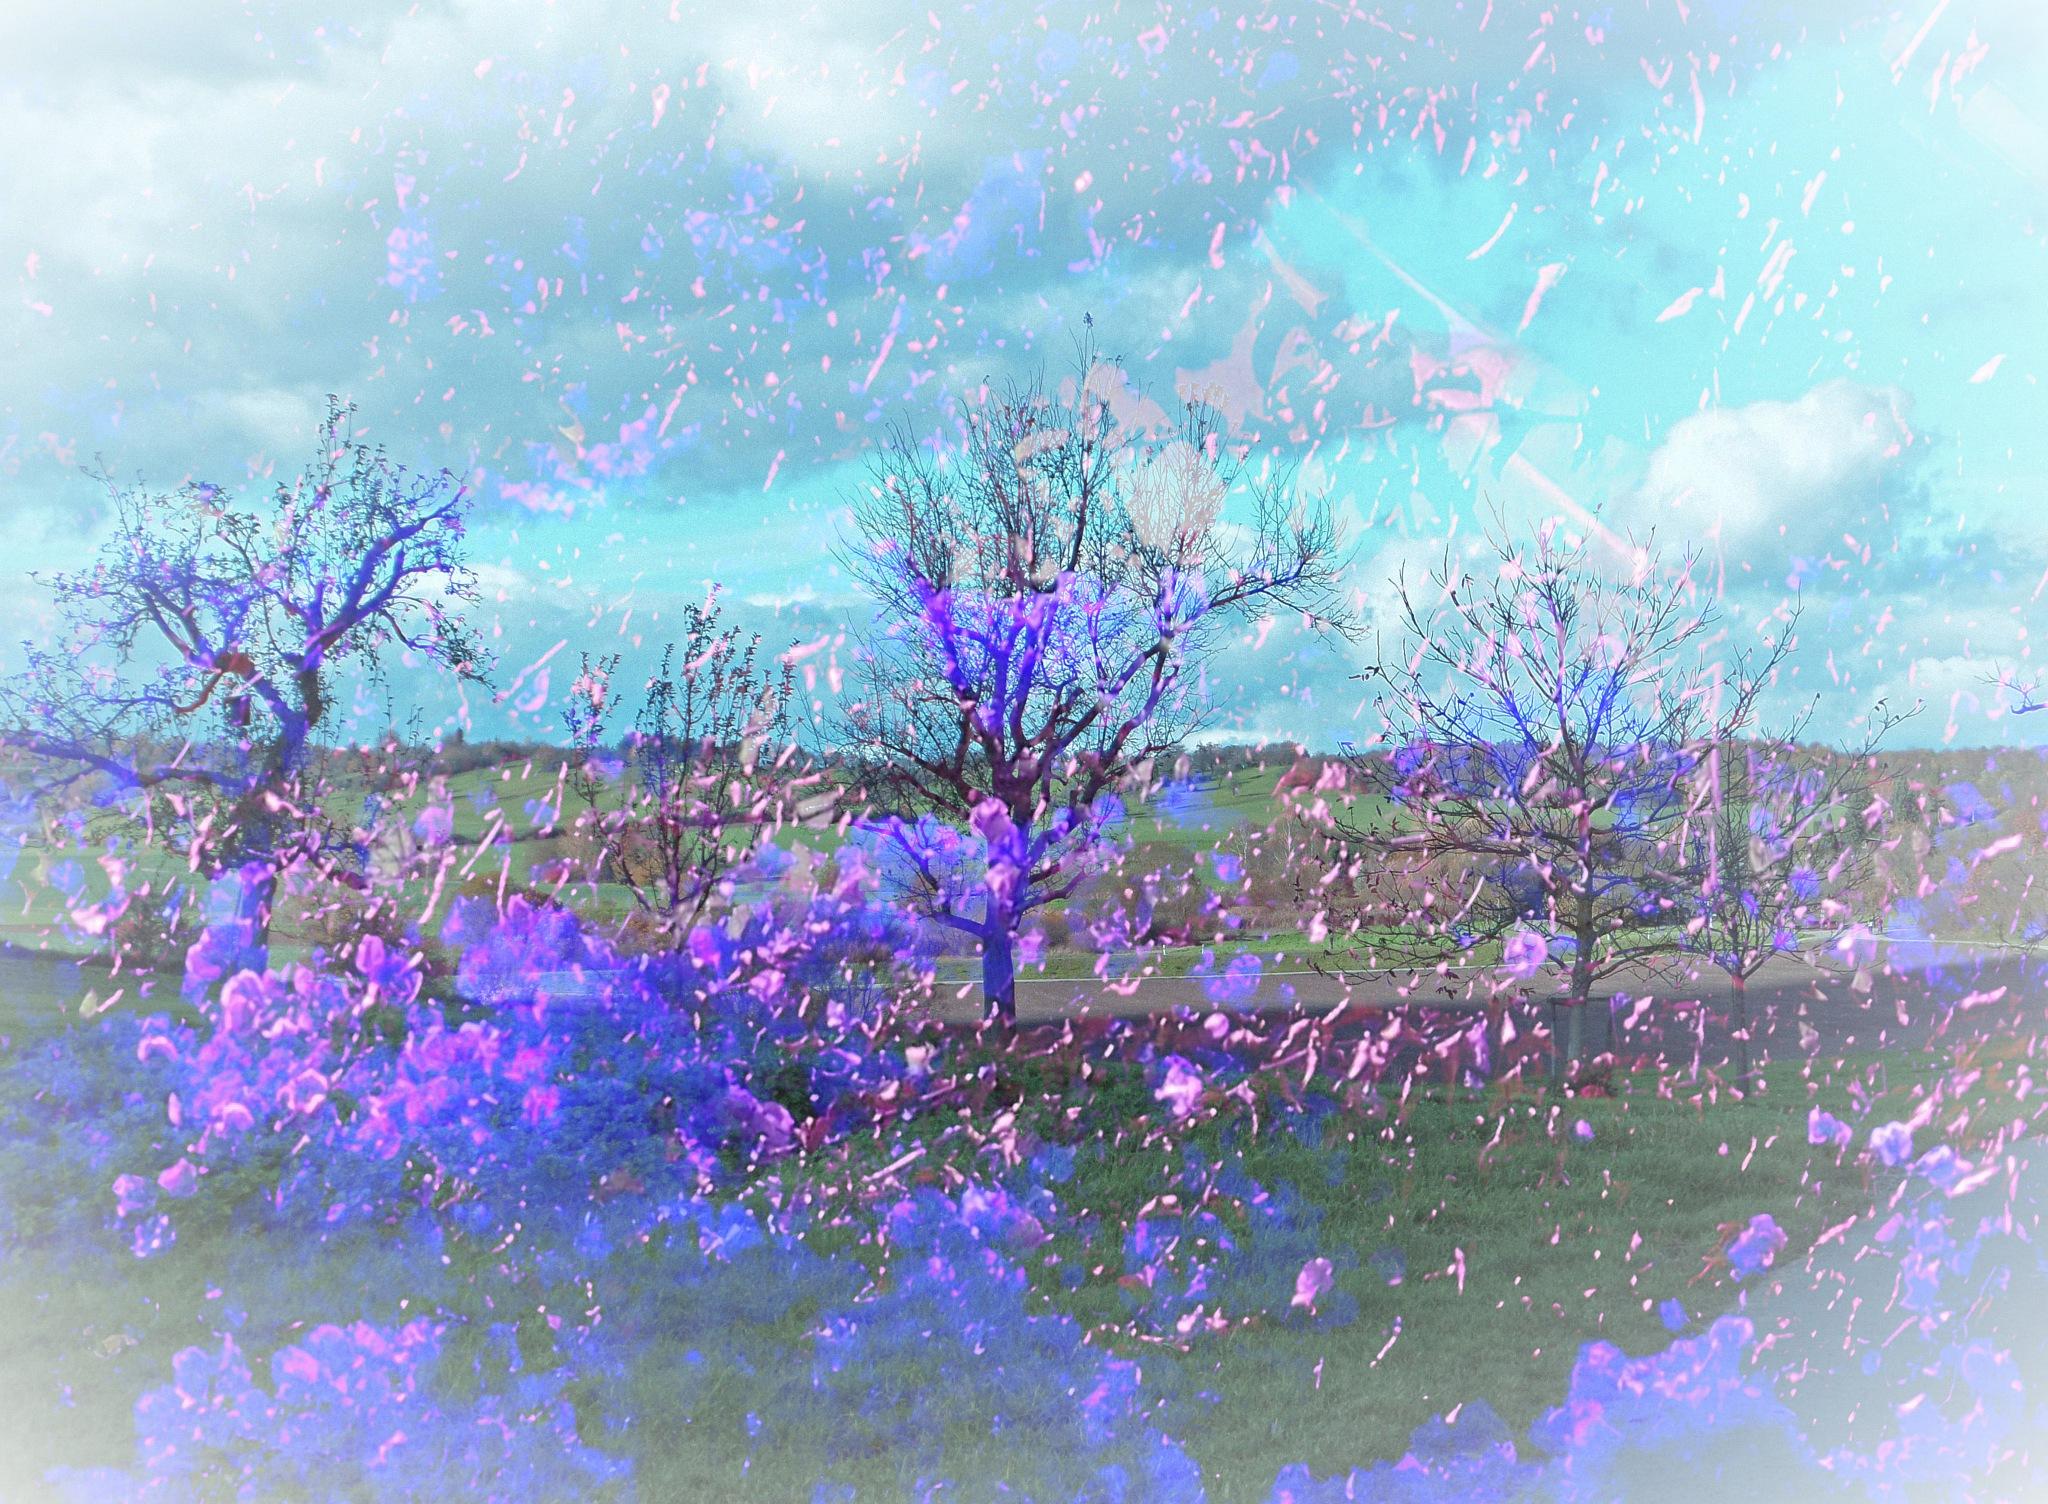 Spring Dream by astarot